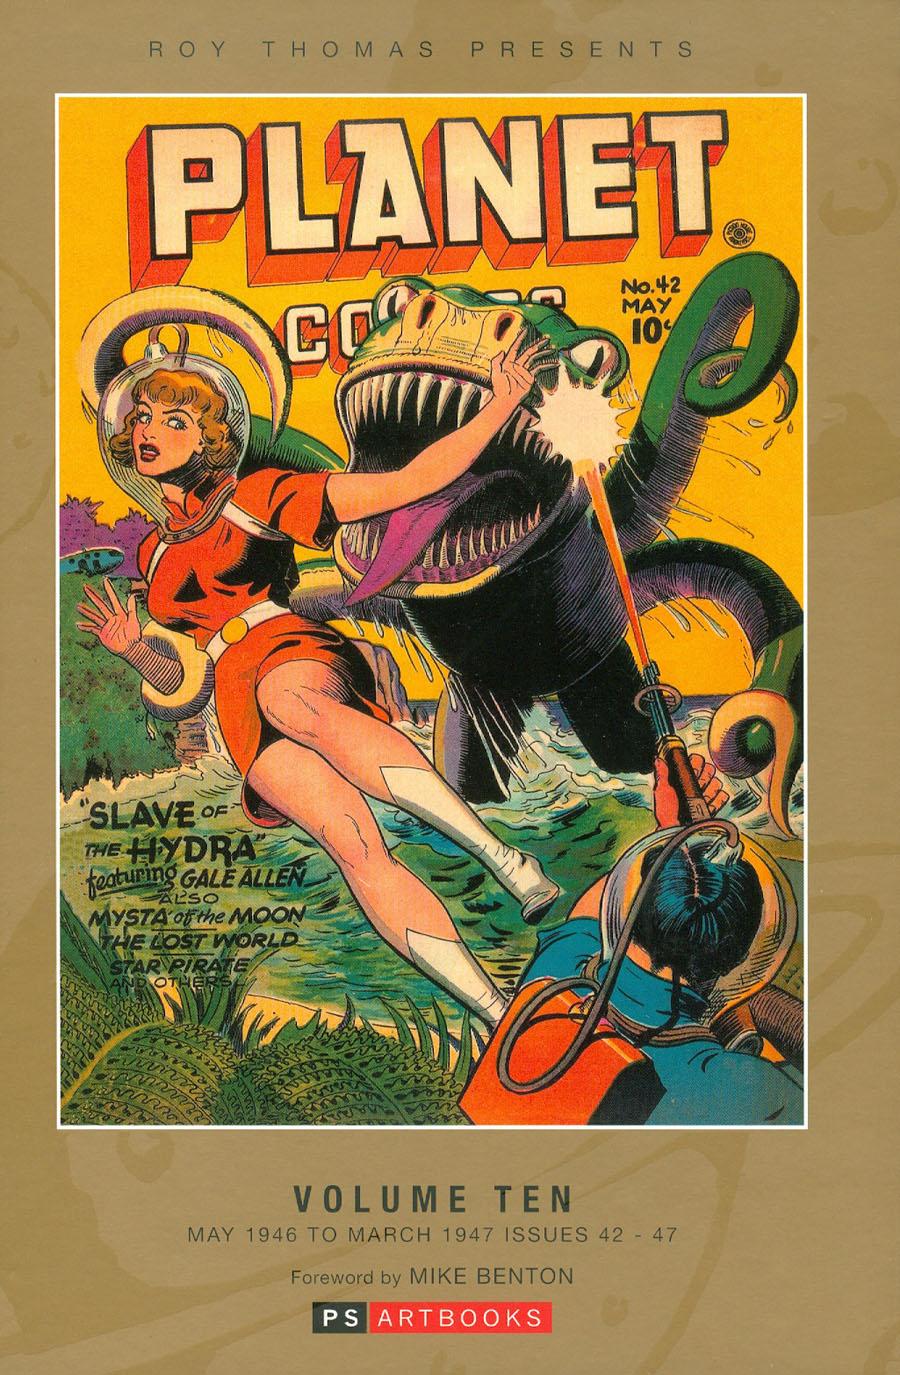 Roy Thomas Presents Planet Comics Vol 10 HC